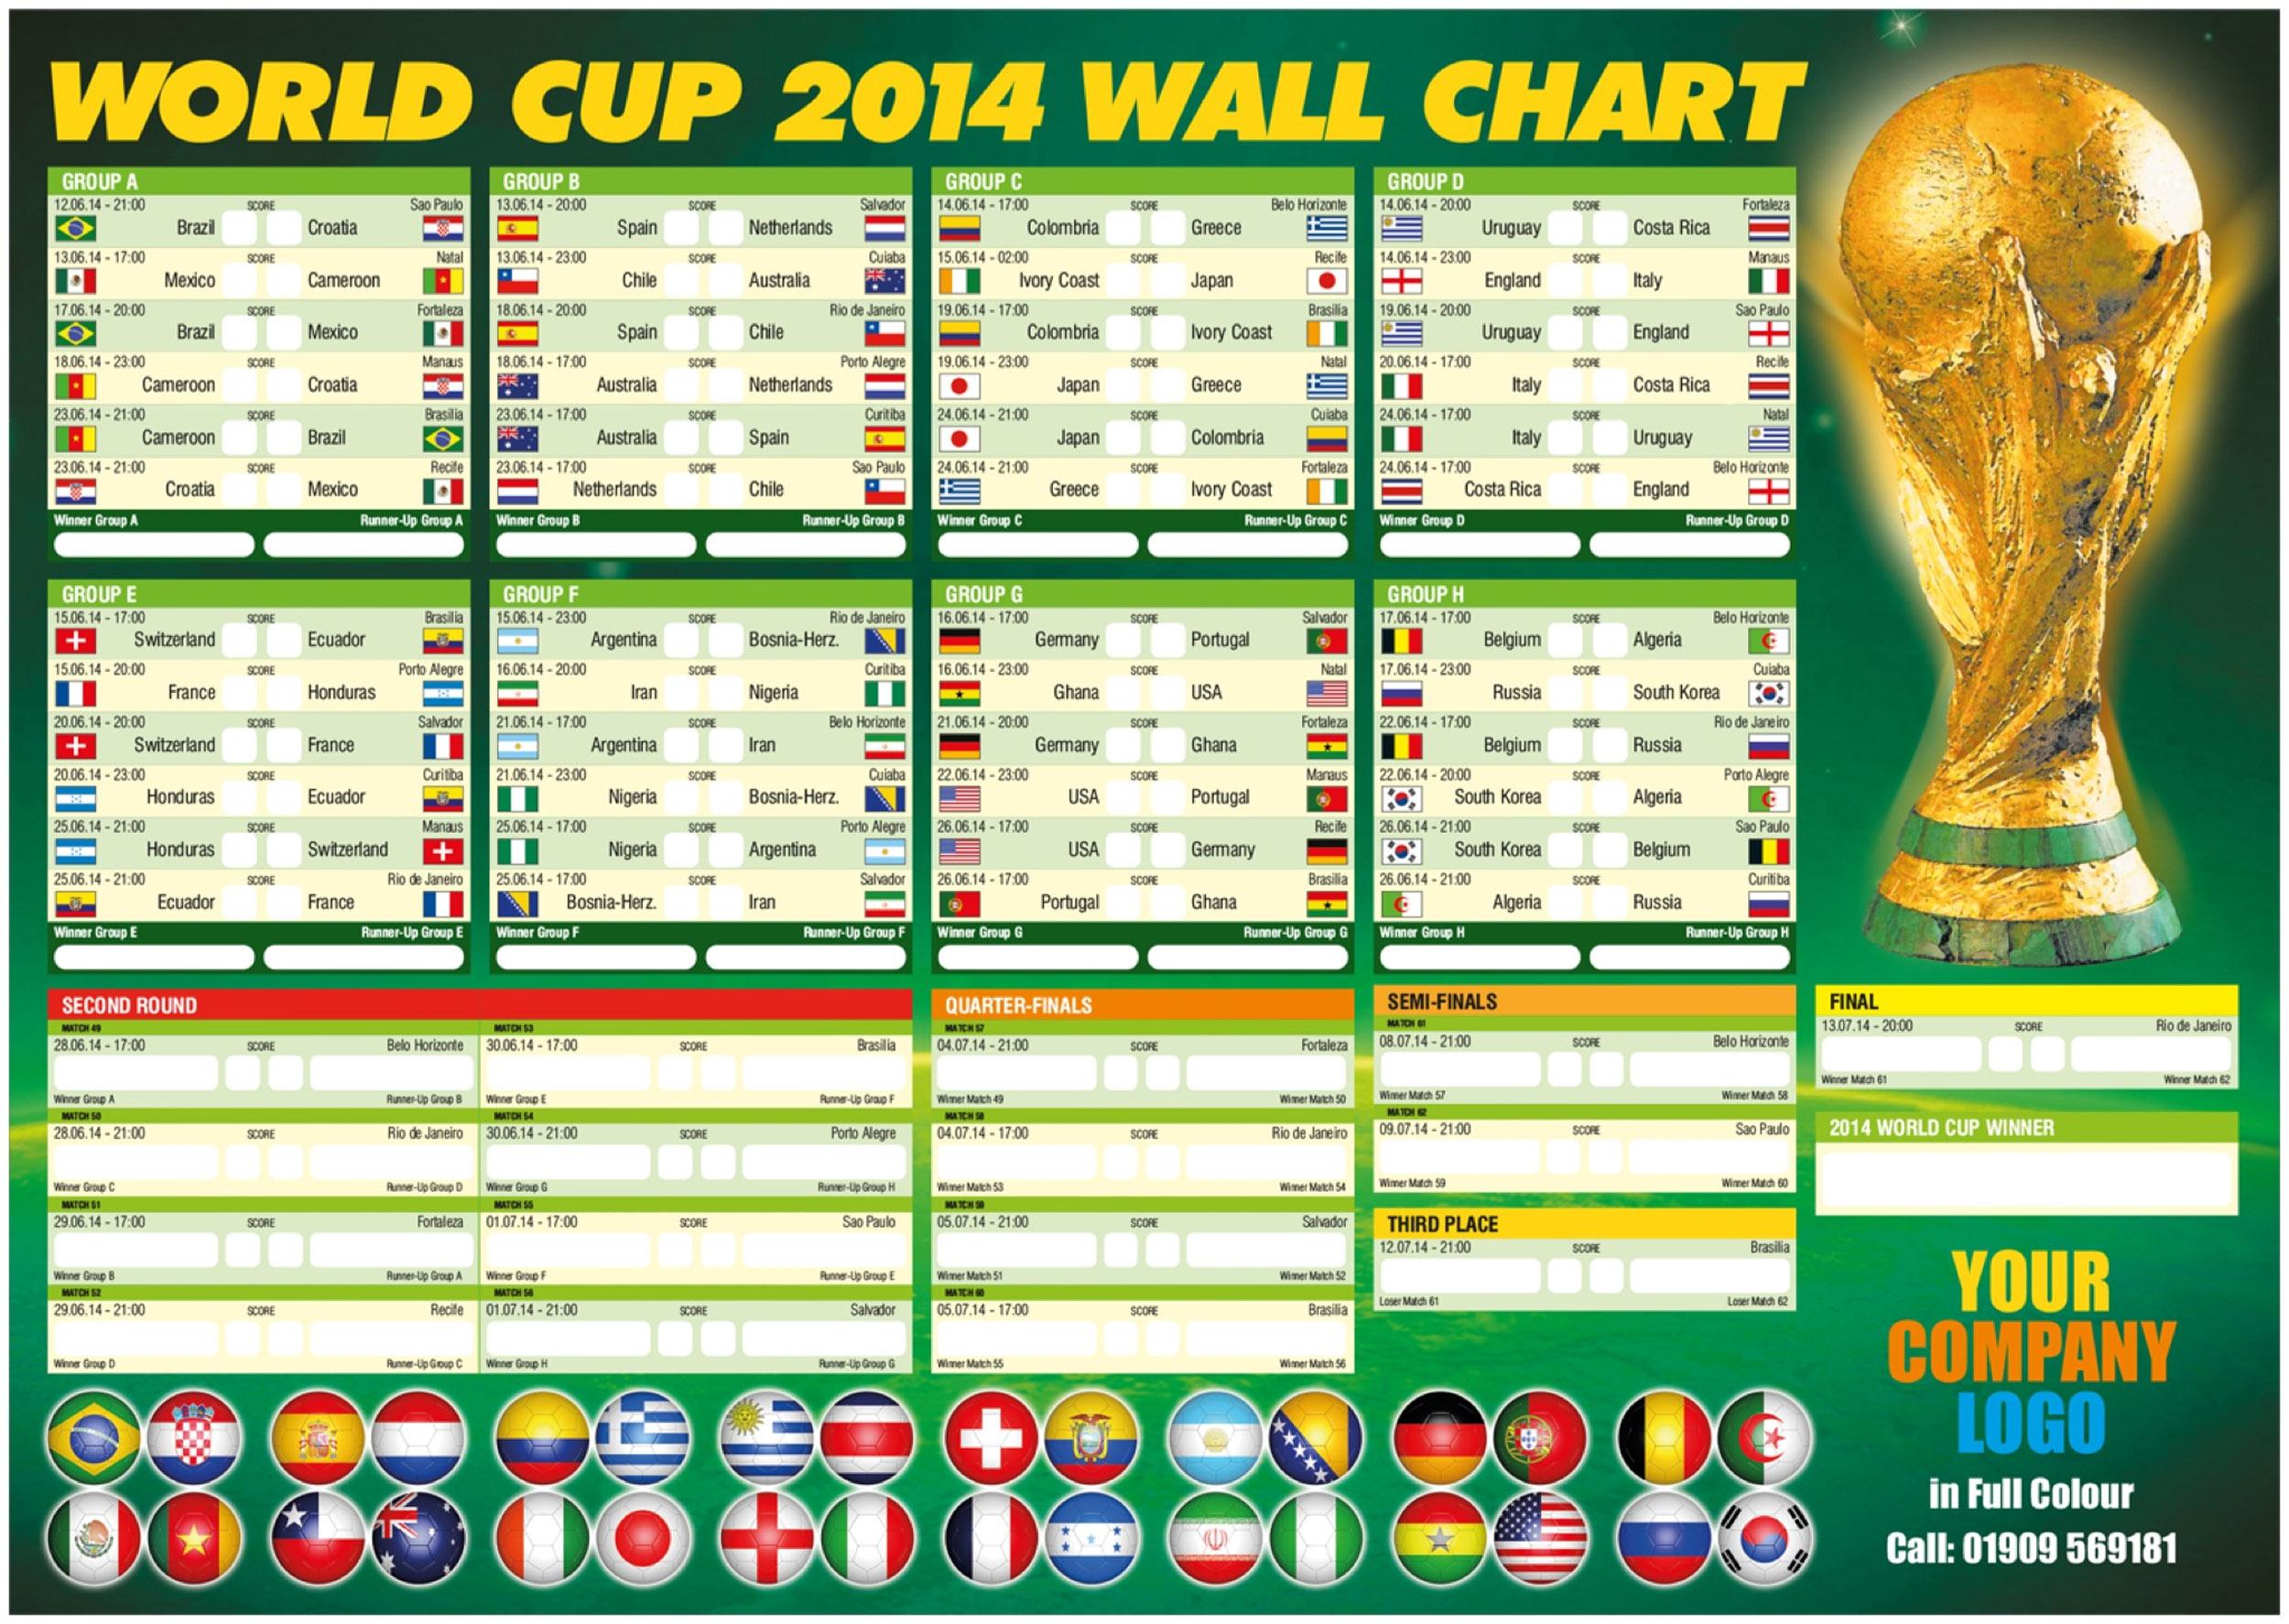 Fifa world cup 2014 match schedule